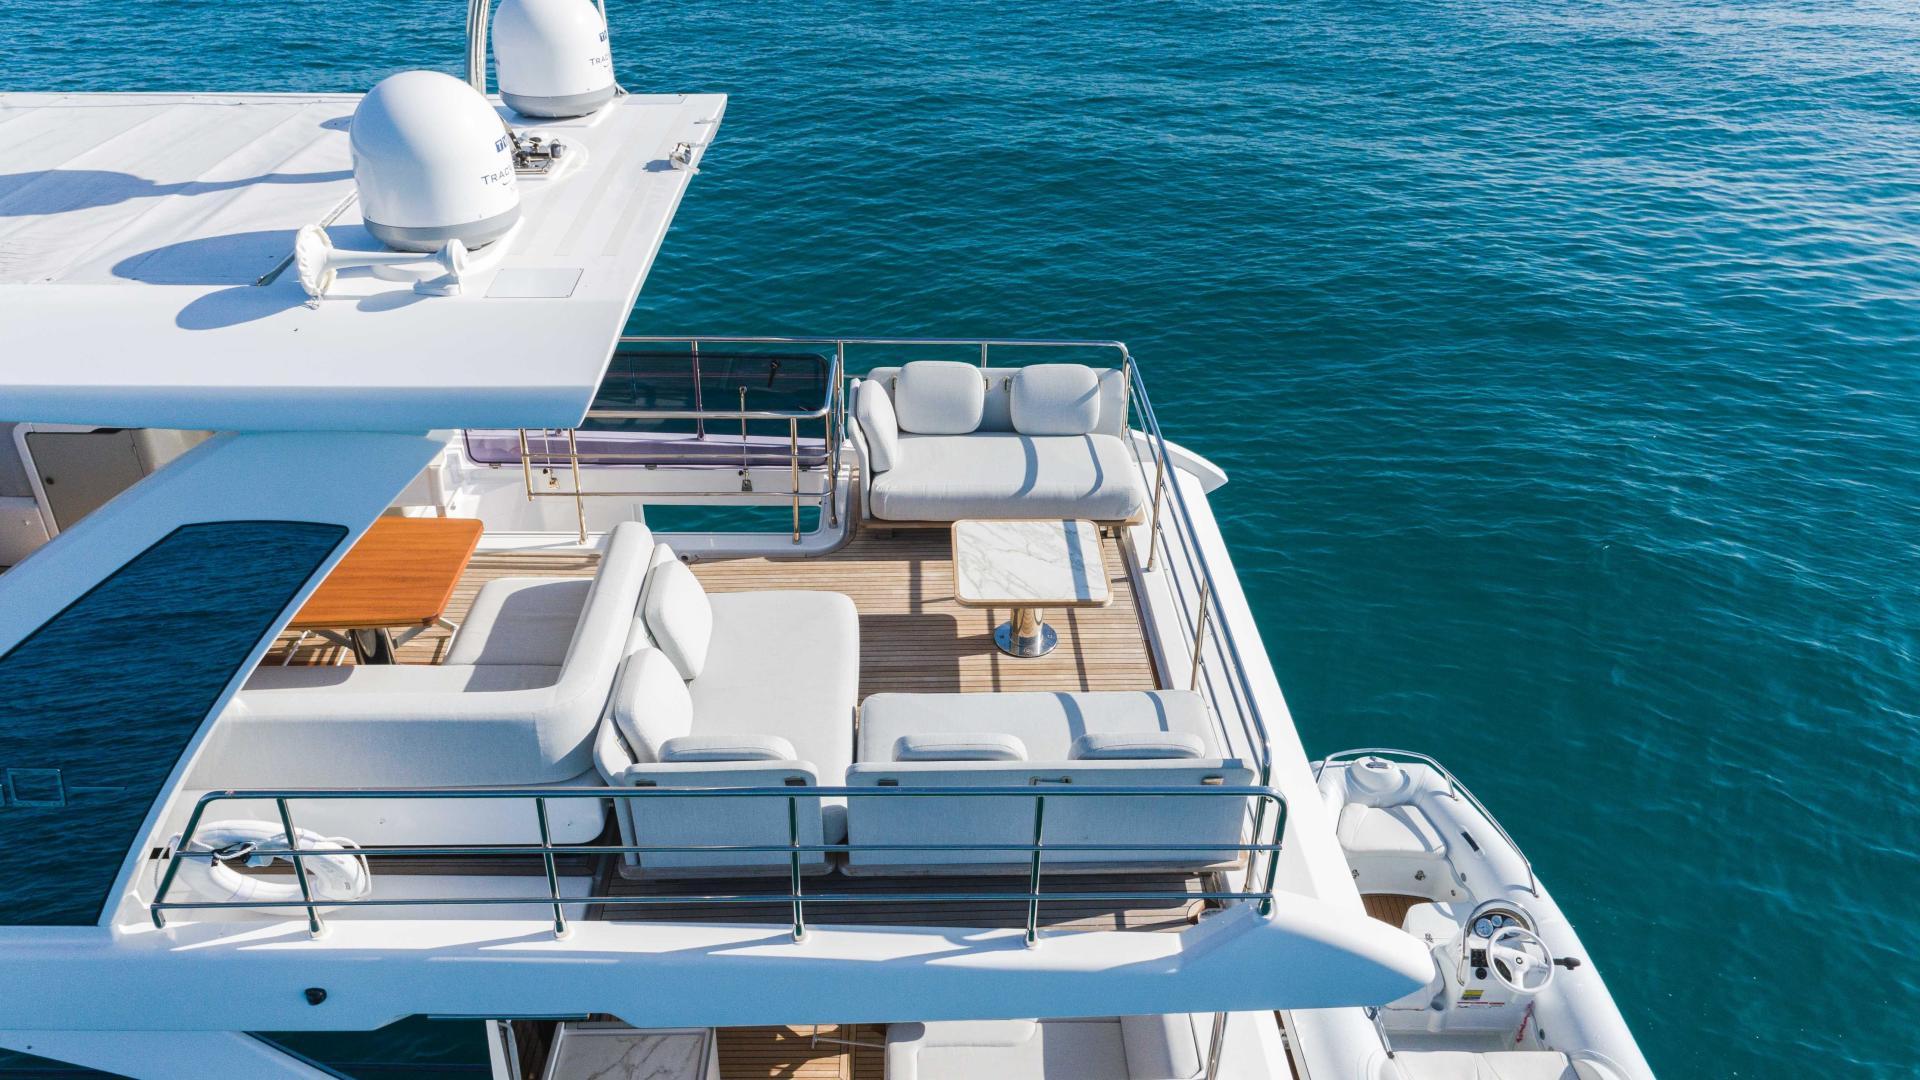 Azimut-60 Fly 2019-Still Dreaming Fisher Island-Florida-United States-1322670 | Thumbnail